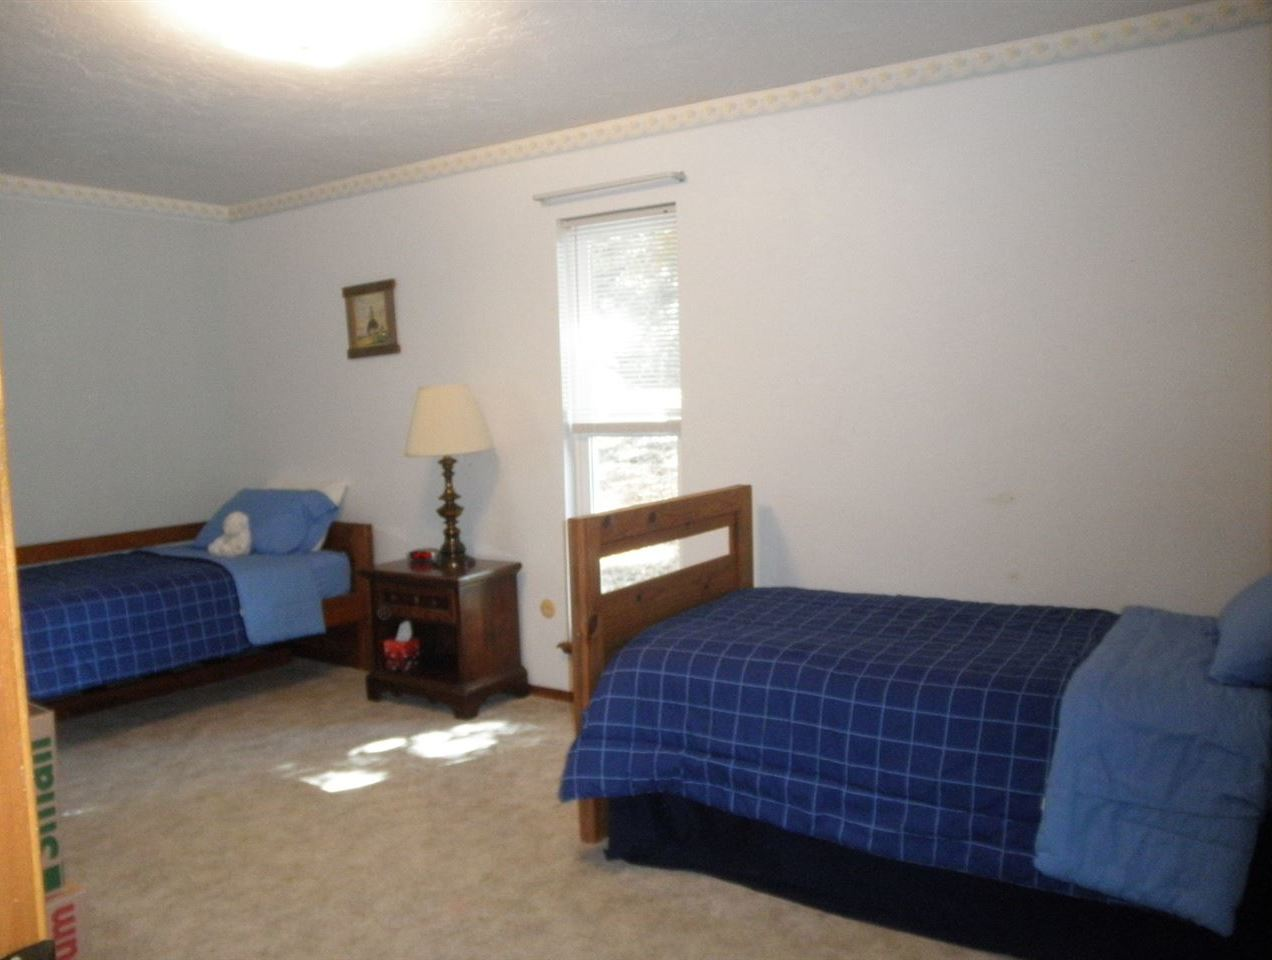 Sold Cross Sale W/ MLS | 1275 S Enterprise Road  Ponca City, OK 74604 10